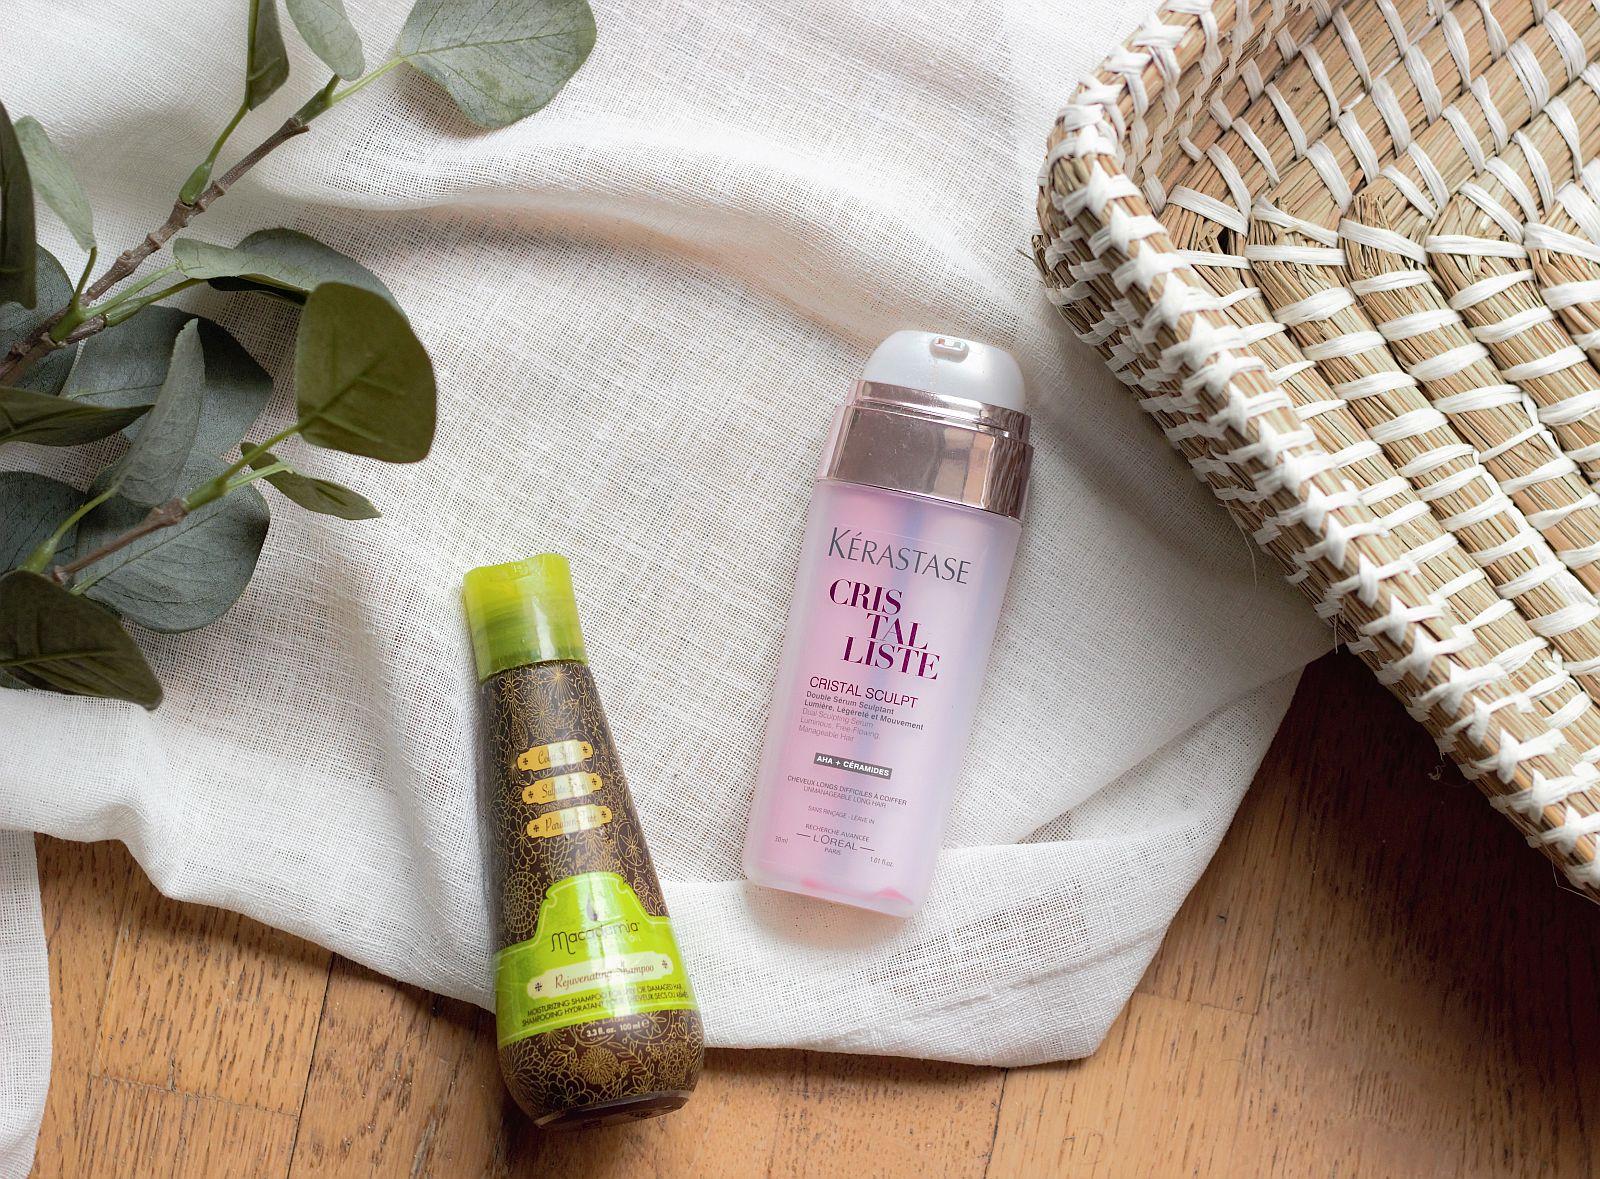 Empties Haircare - Macadamia Rejuvenating Shampoo, Kerastase Sculpt